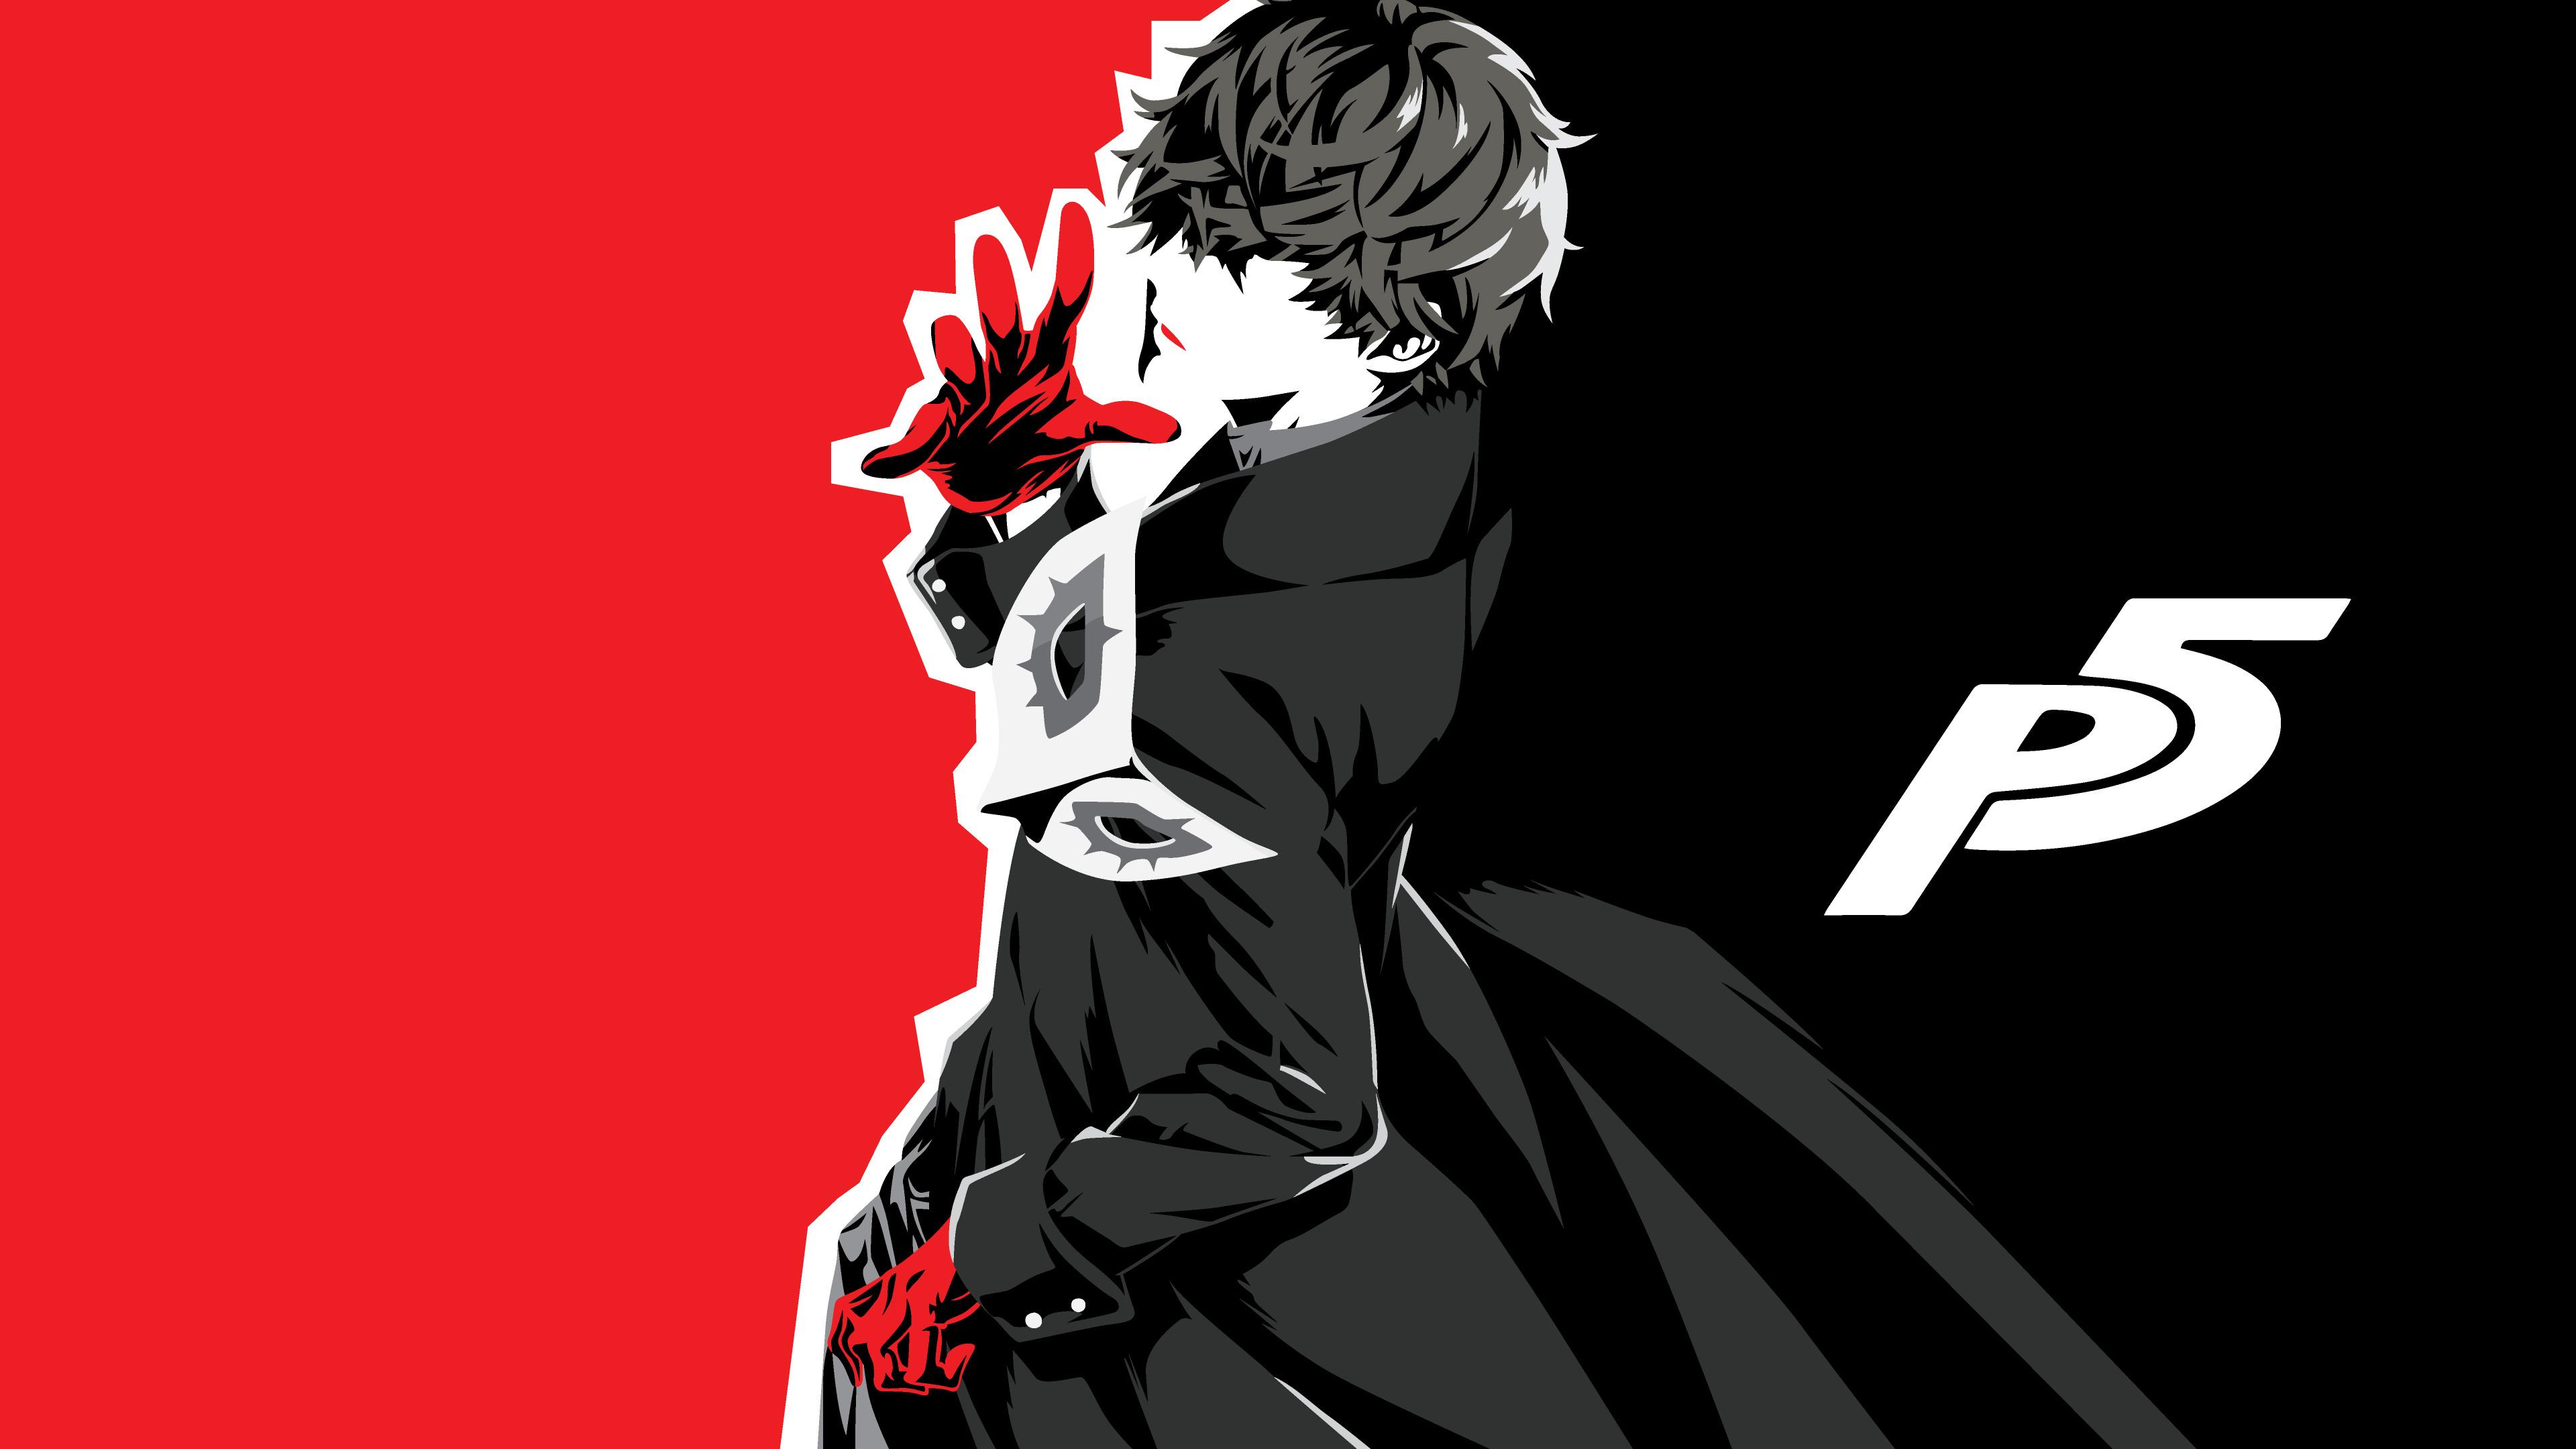 Persona 5 Wallpaper Morgana Cute Download 3840x2400 Wallpaper Akira Kurusu Protagonist